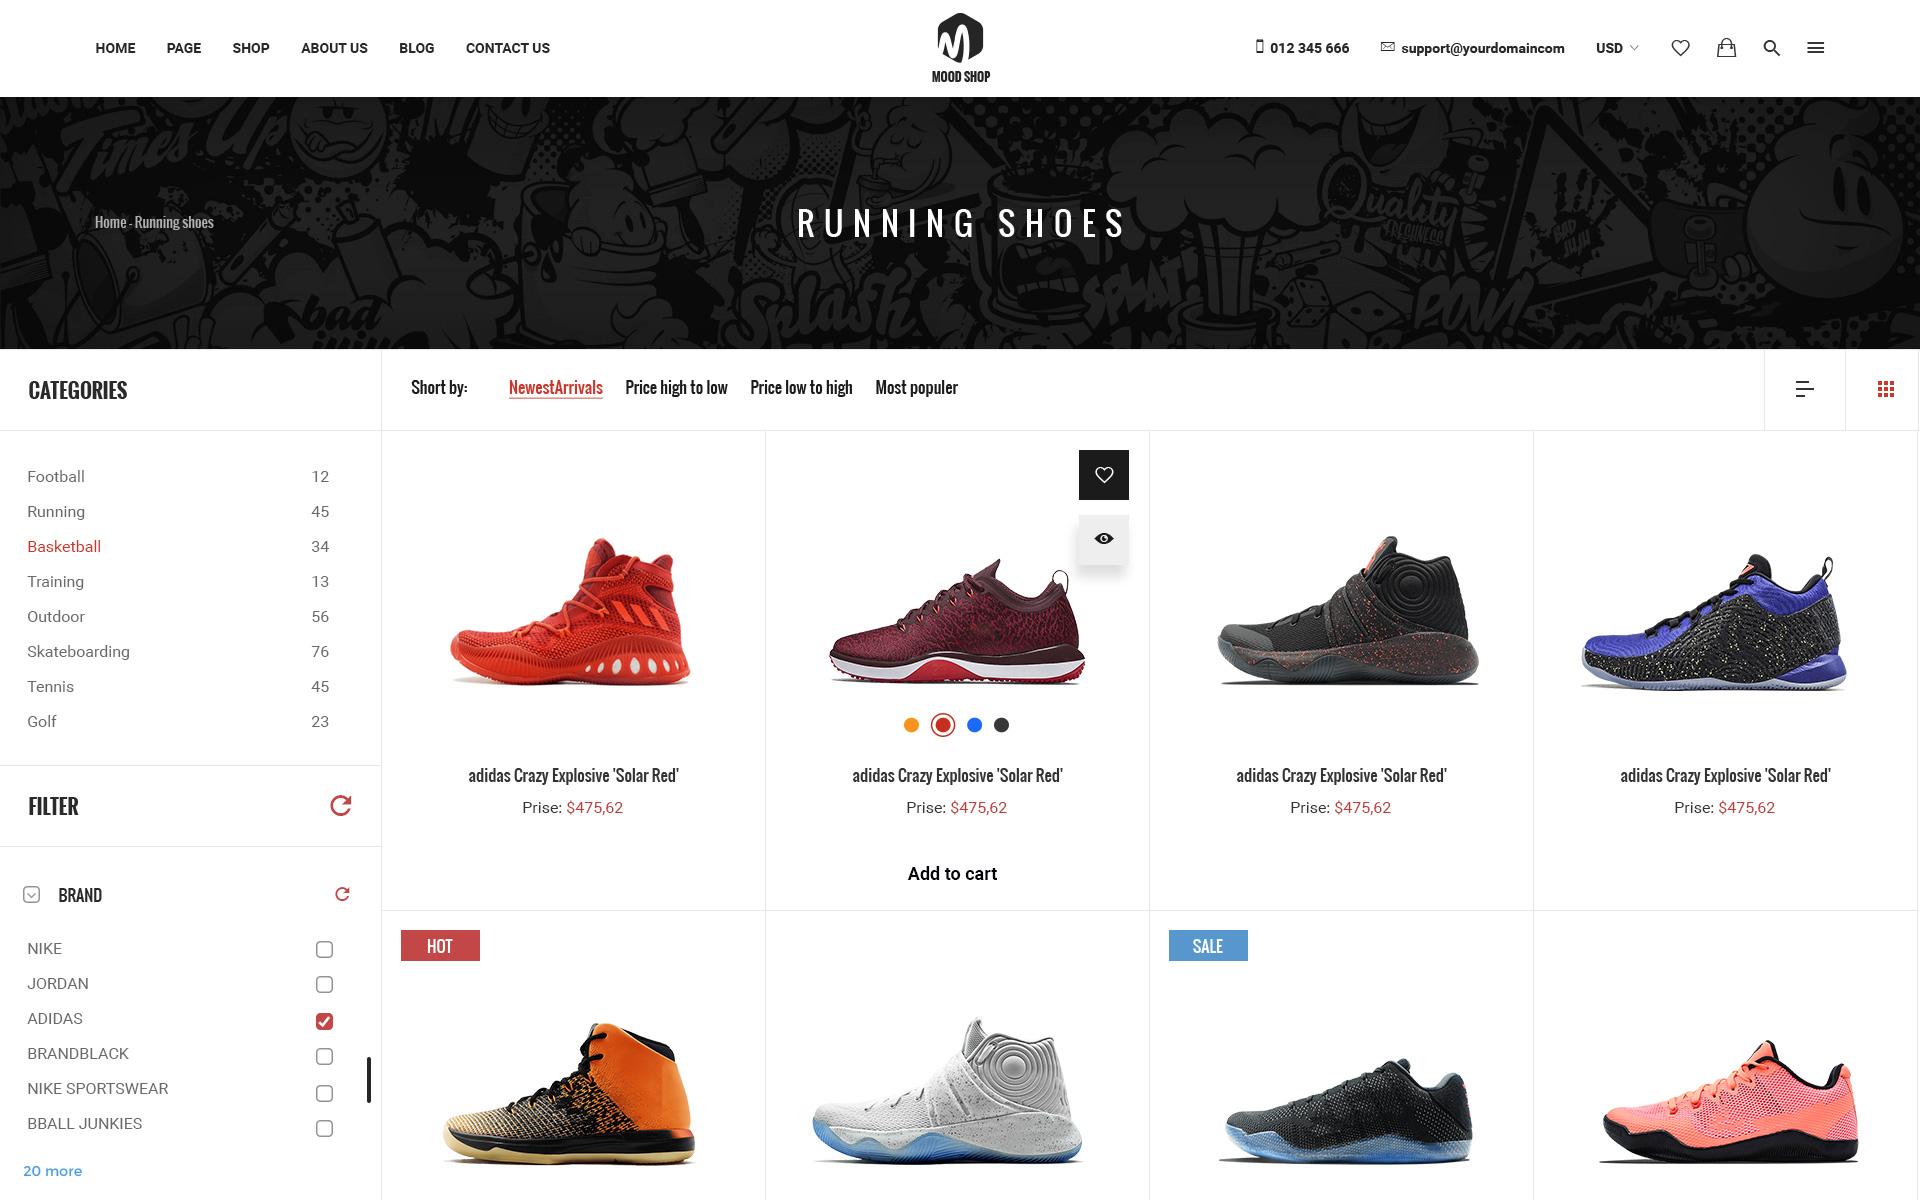 Moodshop - Modern eCommerce Footwear Online Shop PSD Template